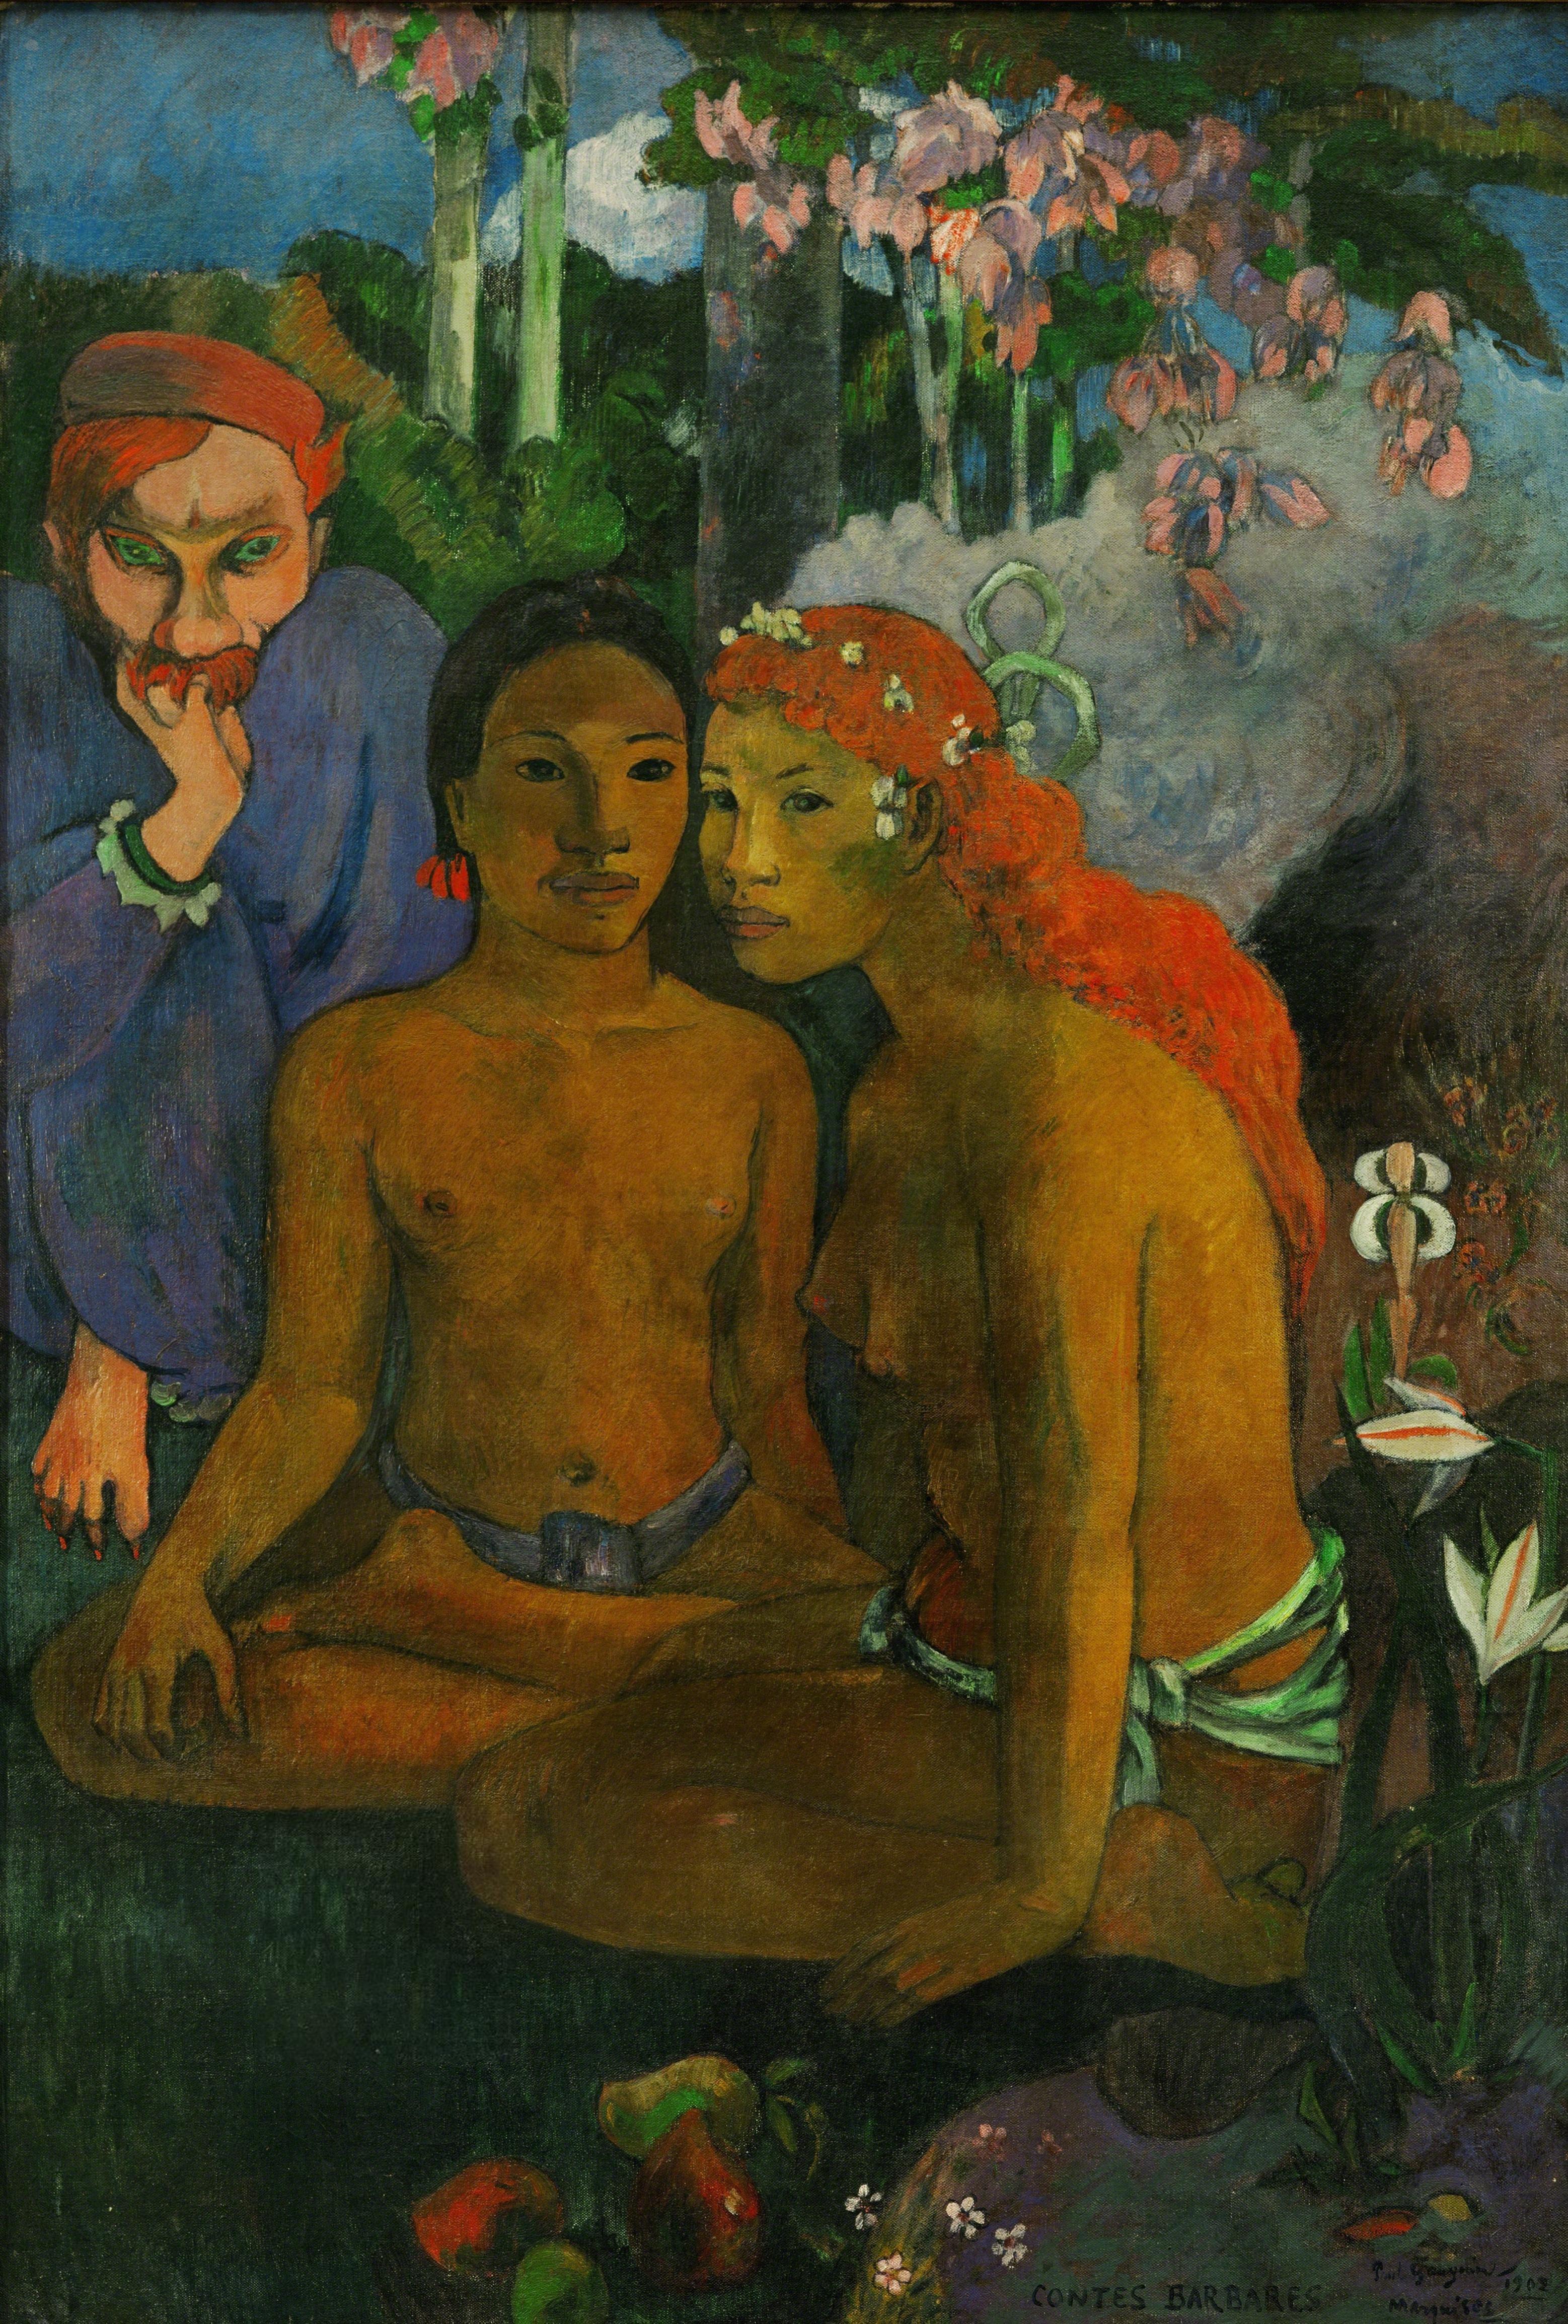 https://upload.wikimedia.org/wikipedia/commons/7/7f/Paul_Gauguin_-_Contes_barbares_%281902%29.jpg